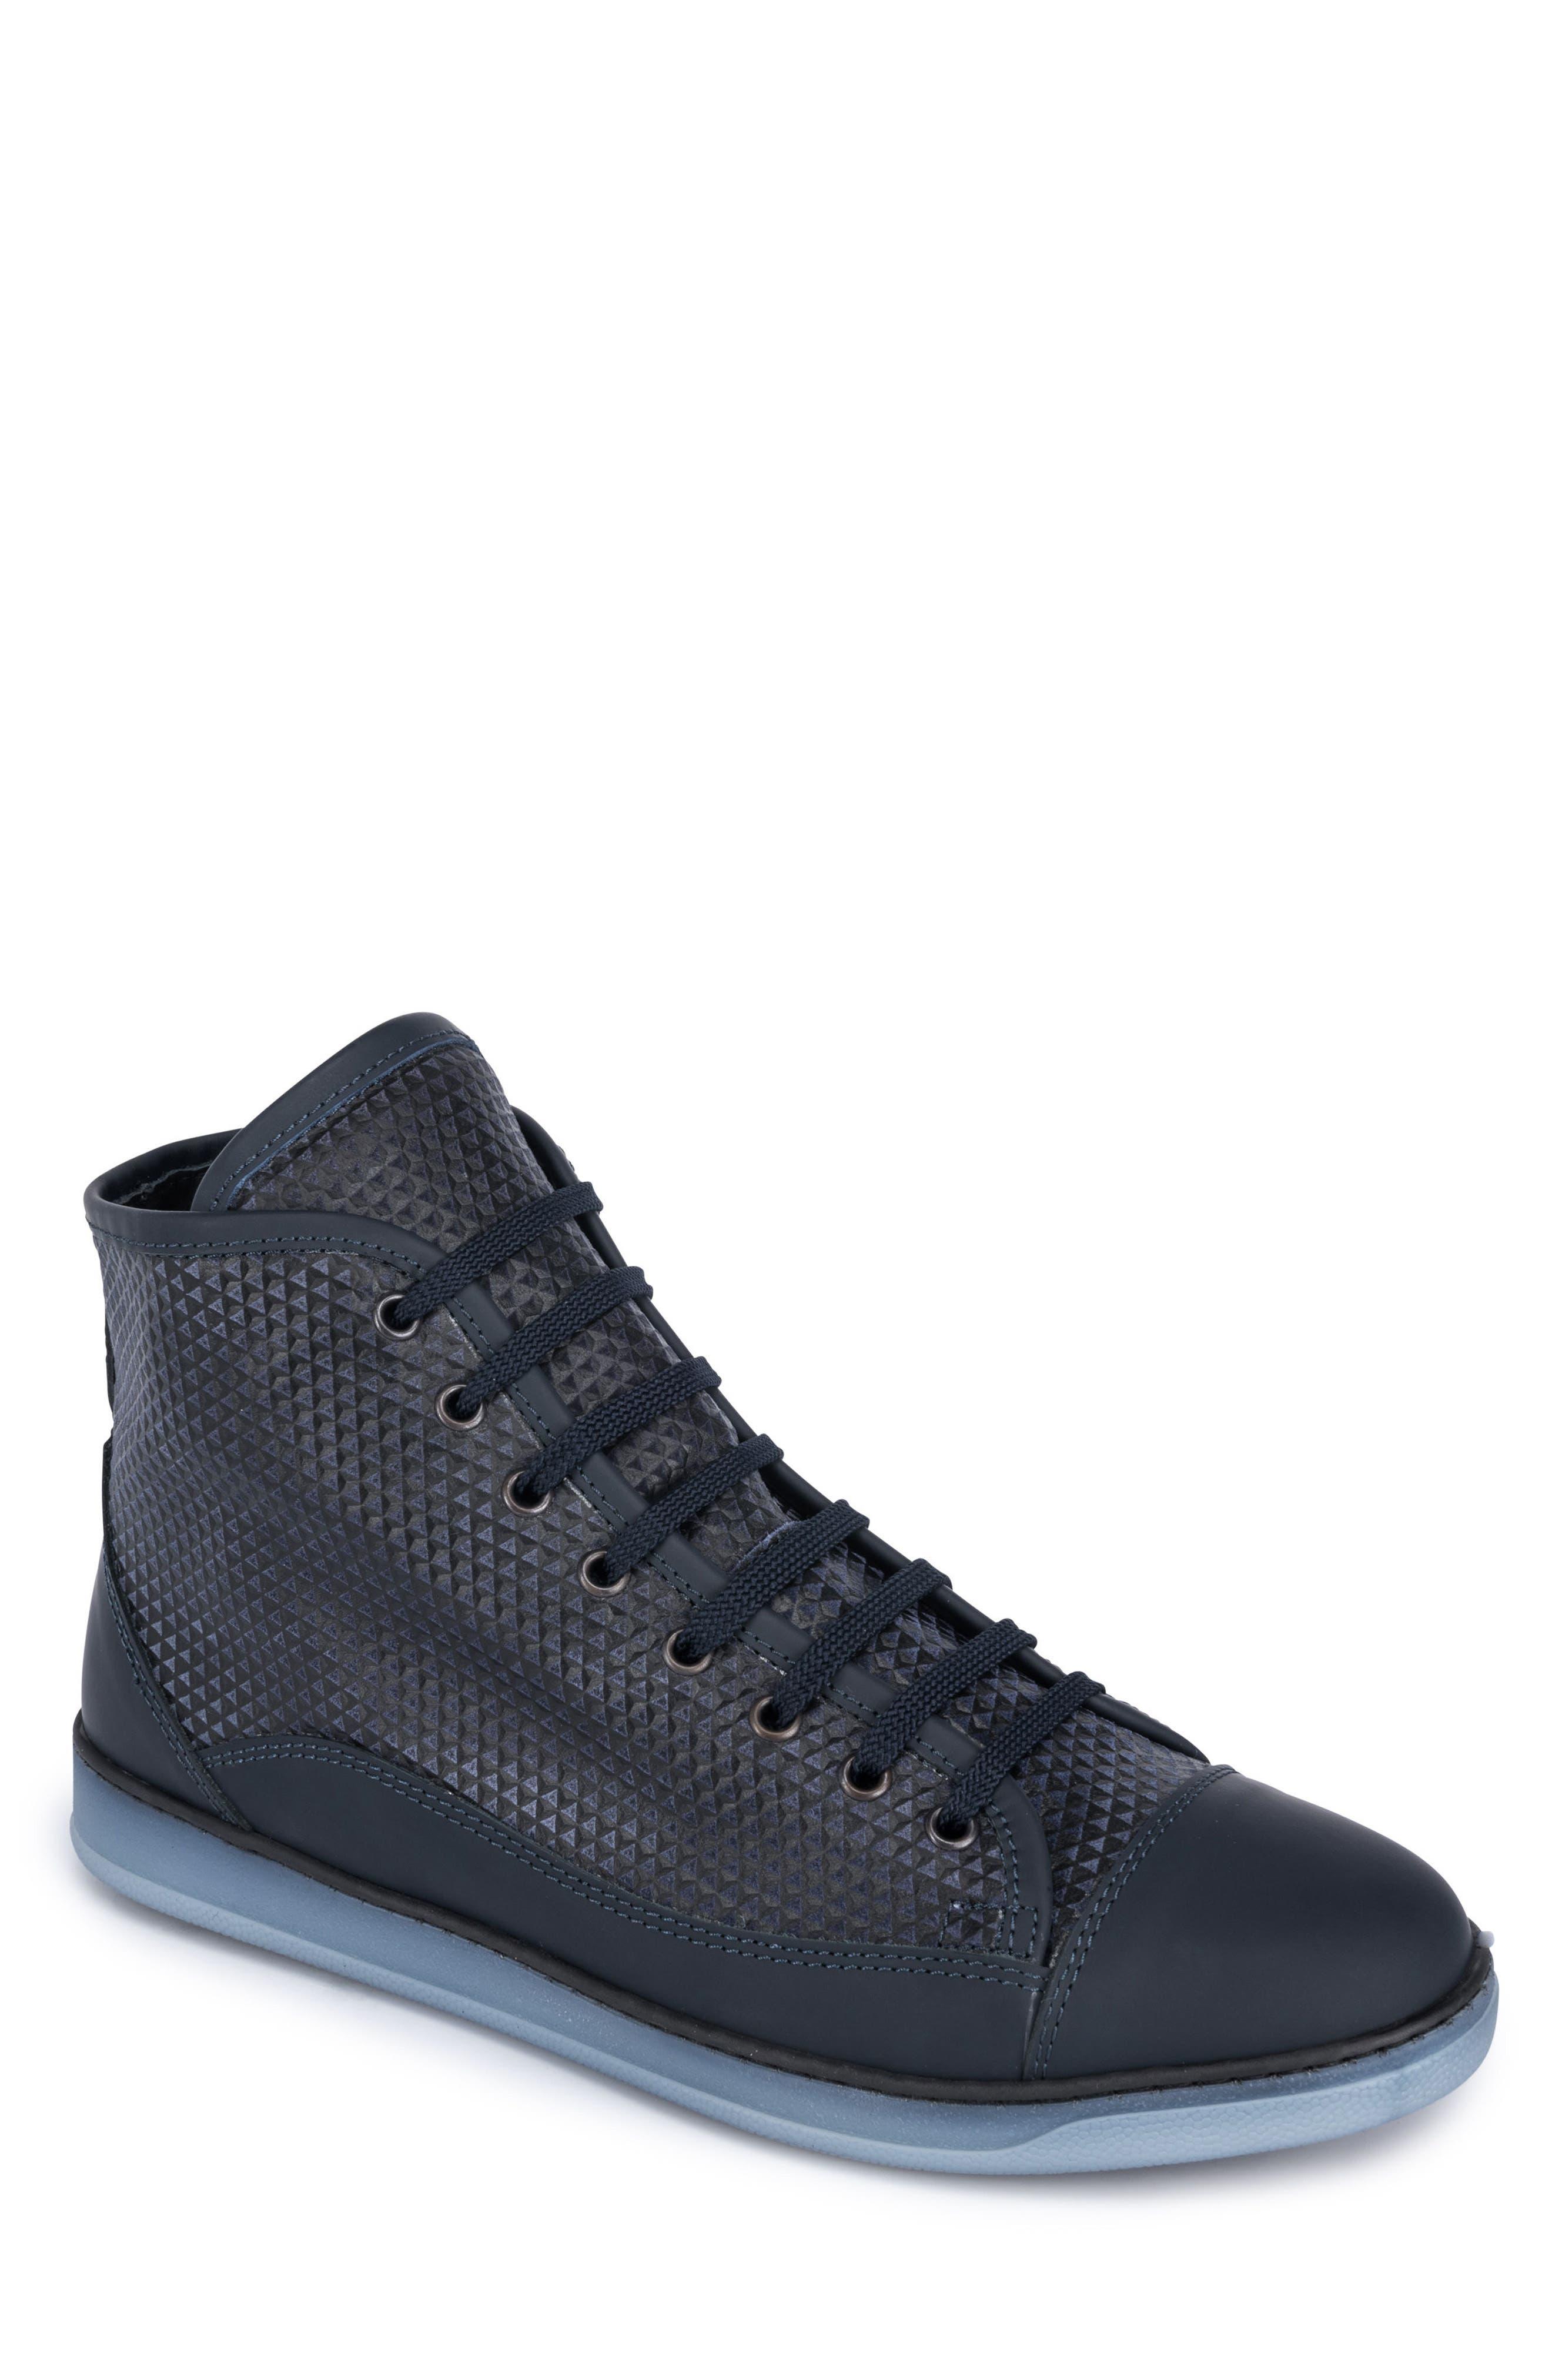 Treviso Sneaker,                         Main,                         color, 409